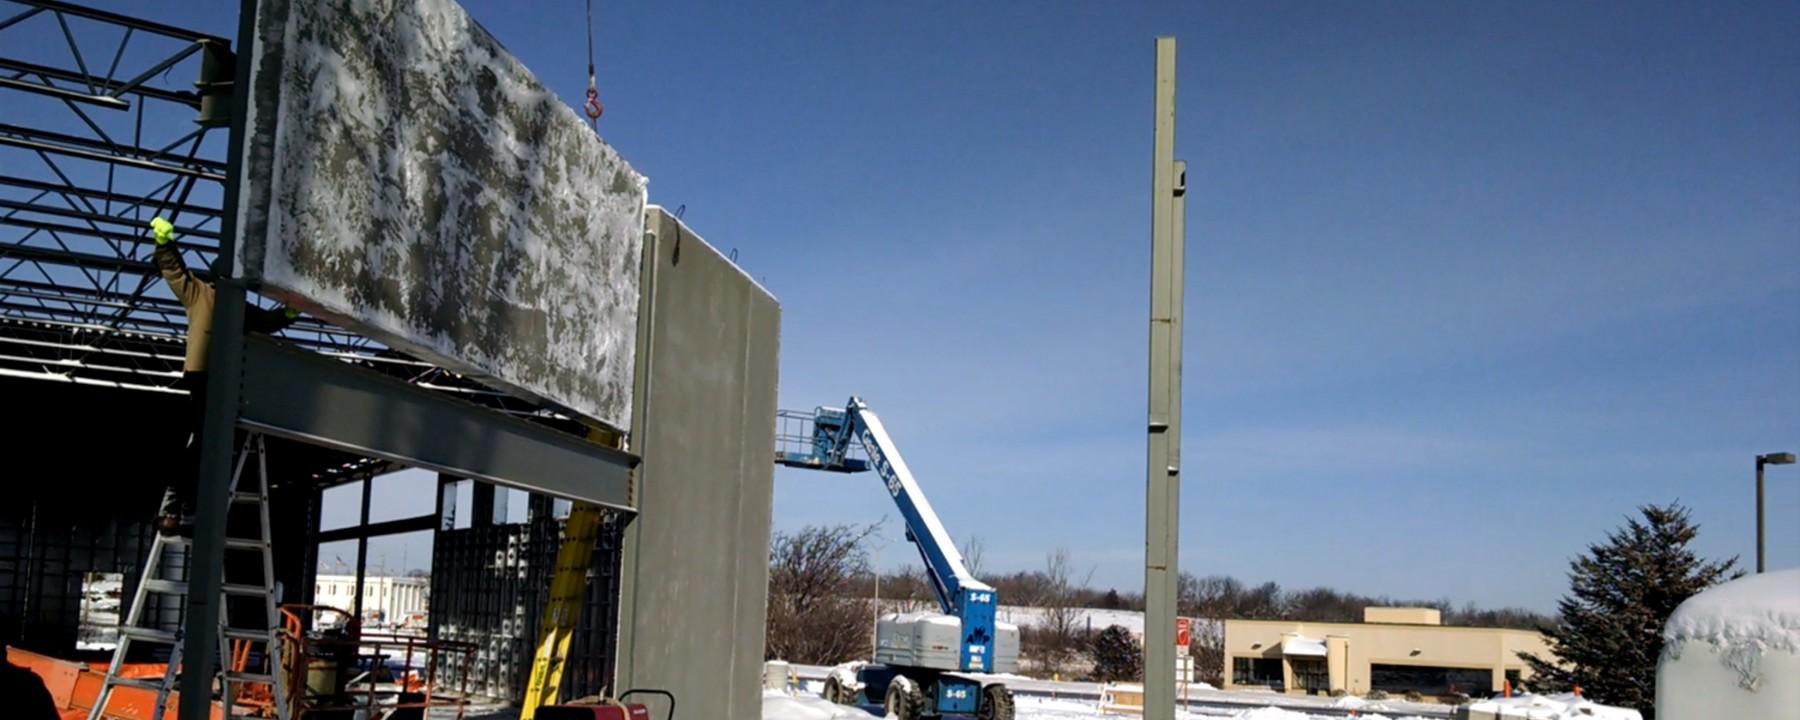 Good Harvest Market Project   Light Weight of Panels Simplifies Construction